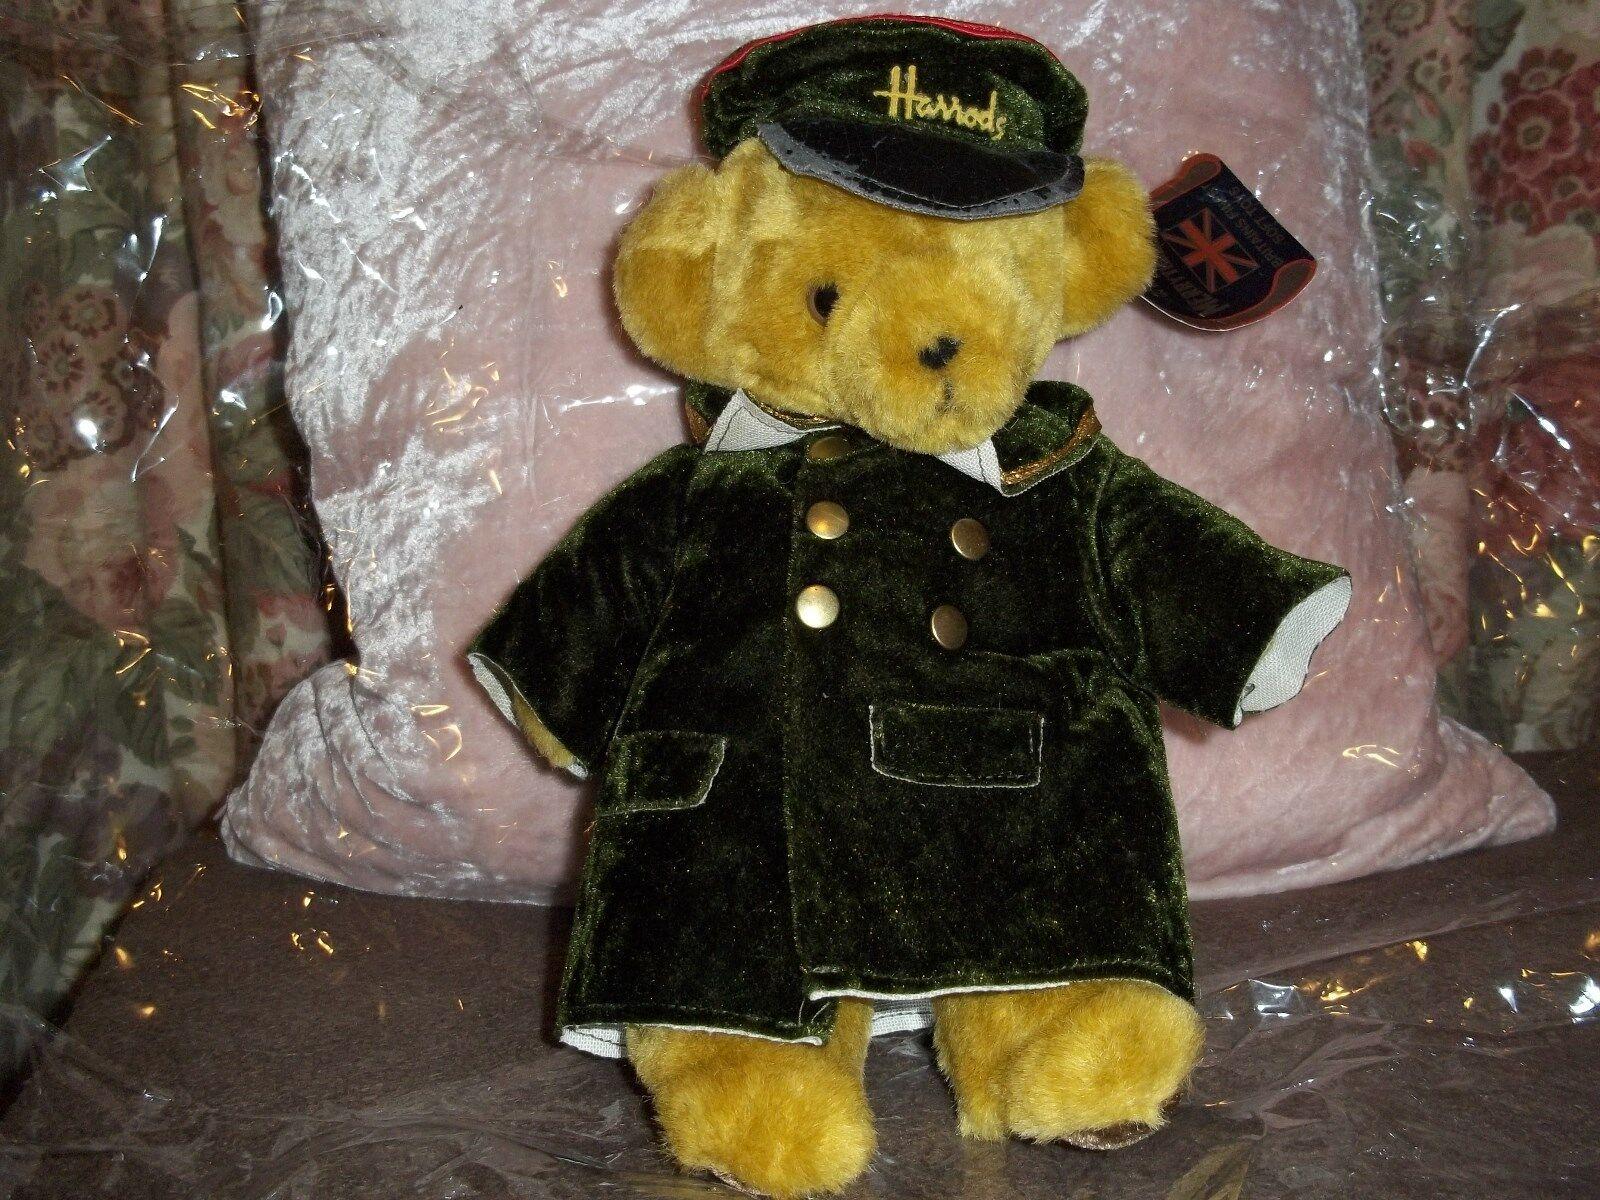 VINTAGE Merry Thought Esclusiva Harrods PORTIERE Teddy Bear